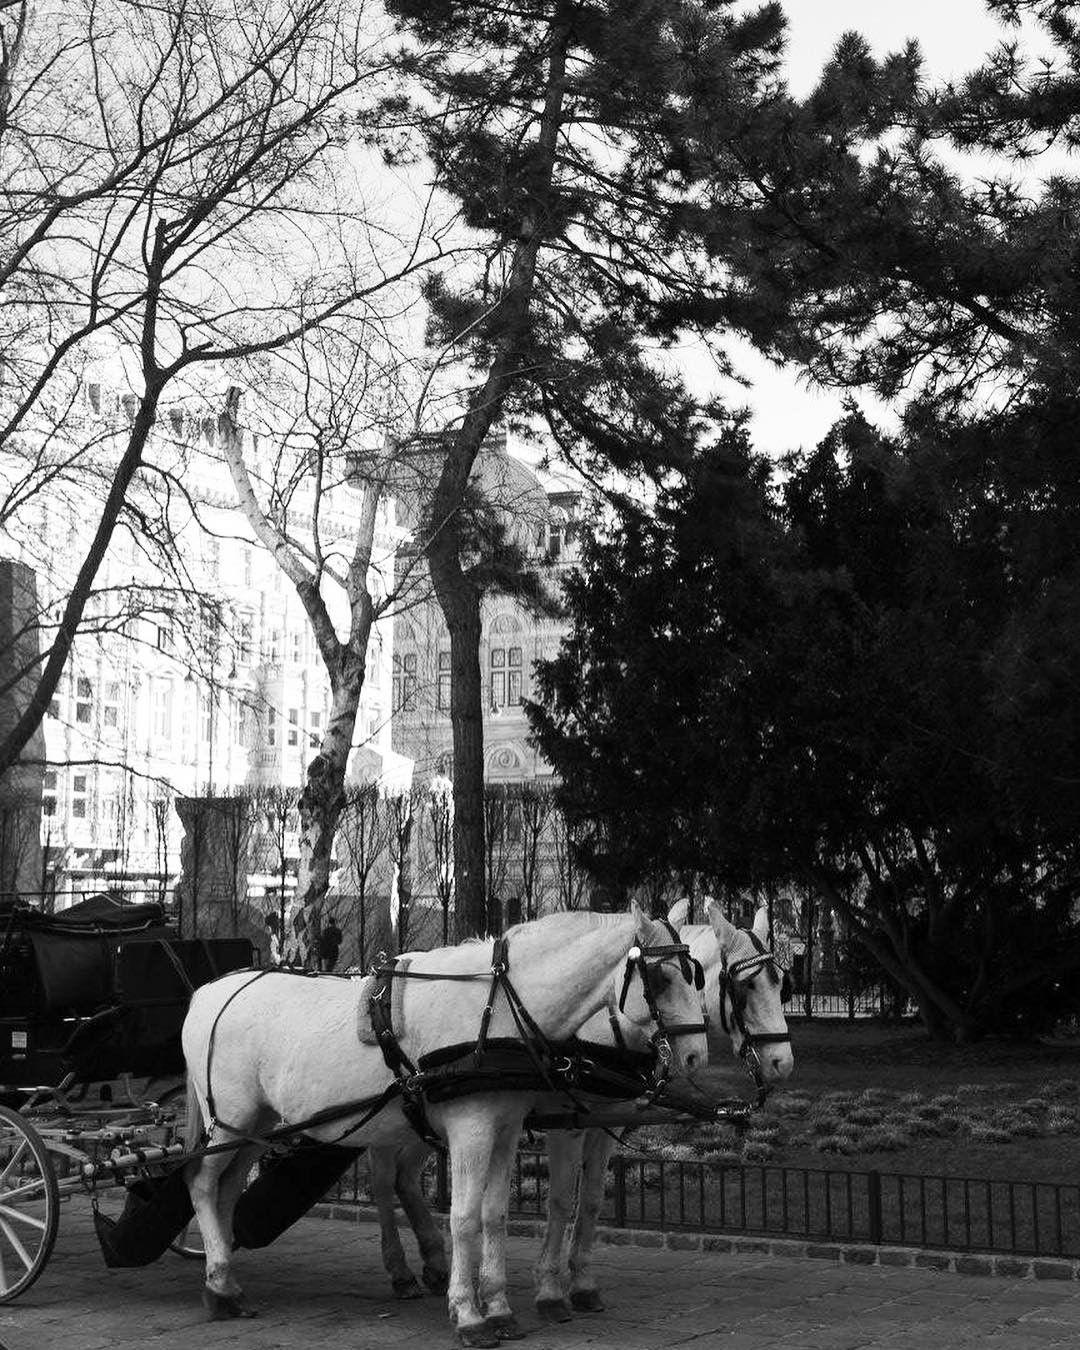 clipclop horse vienna wien - Must See Wien